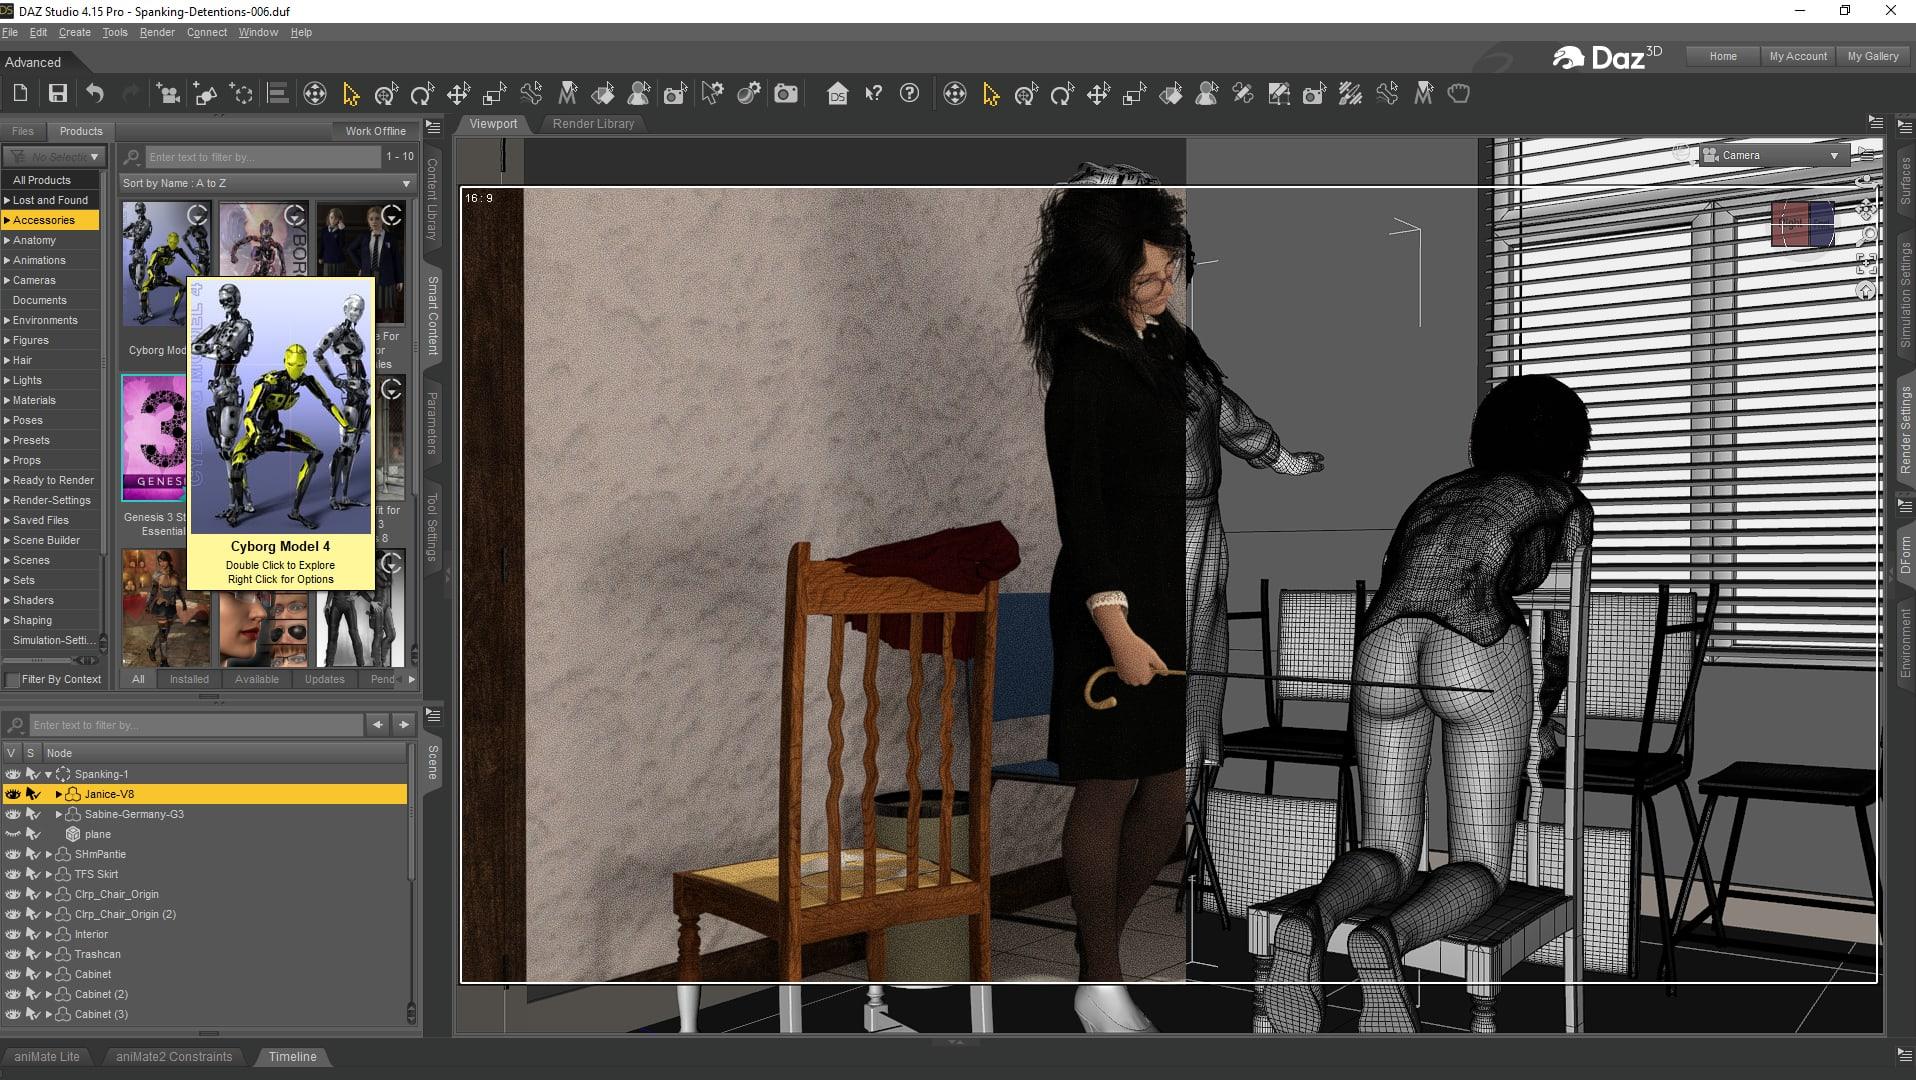 Artists 3d drawing program Daz3d Creating Free Spanking Artwork